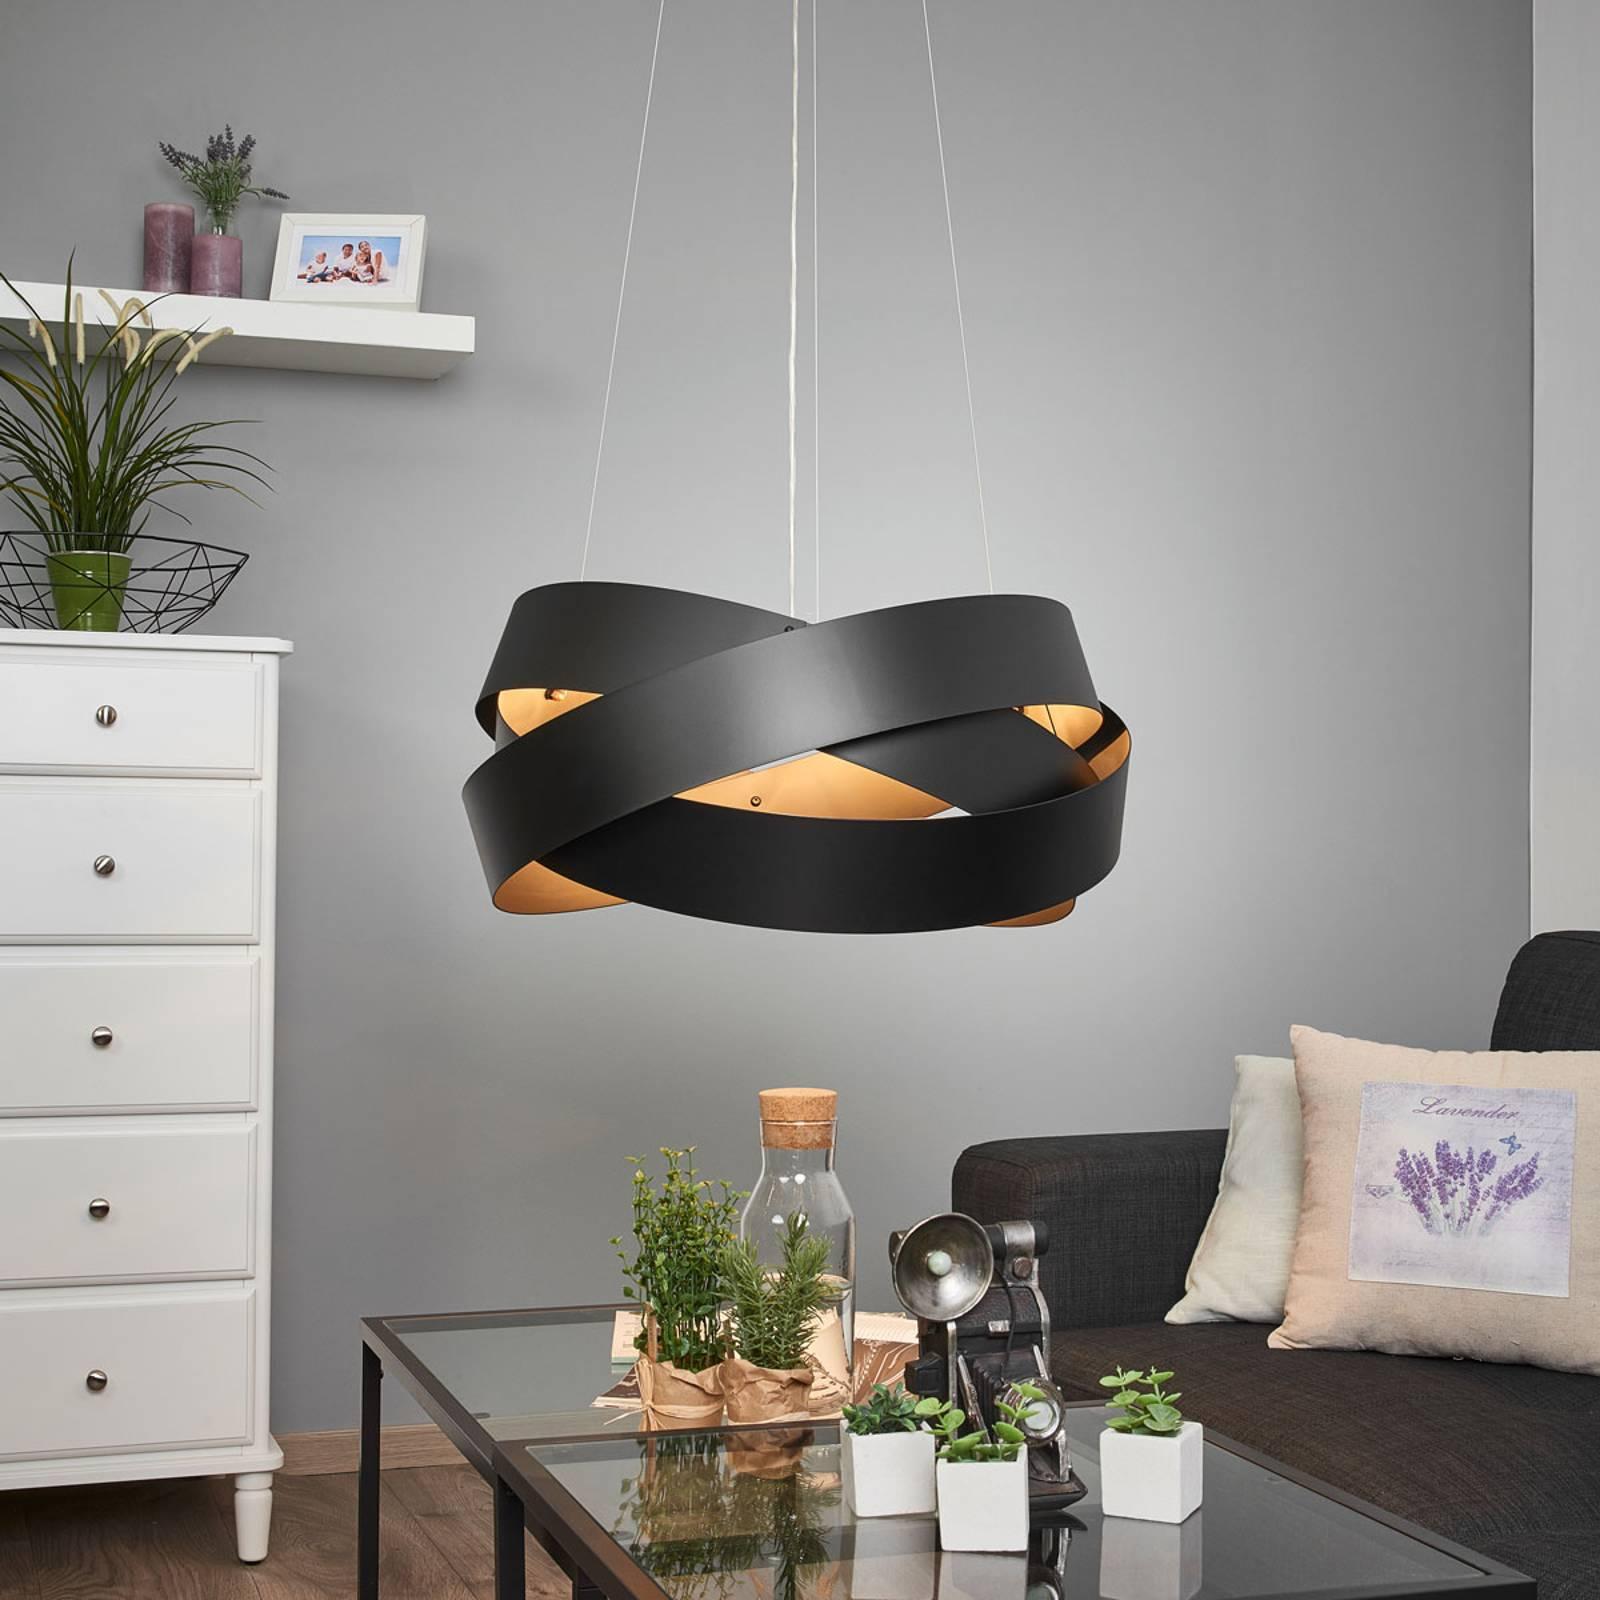 Hanglamp Pura in zwart